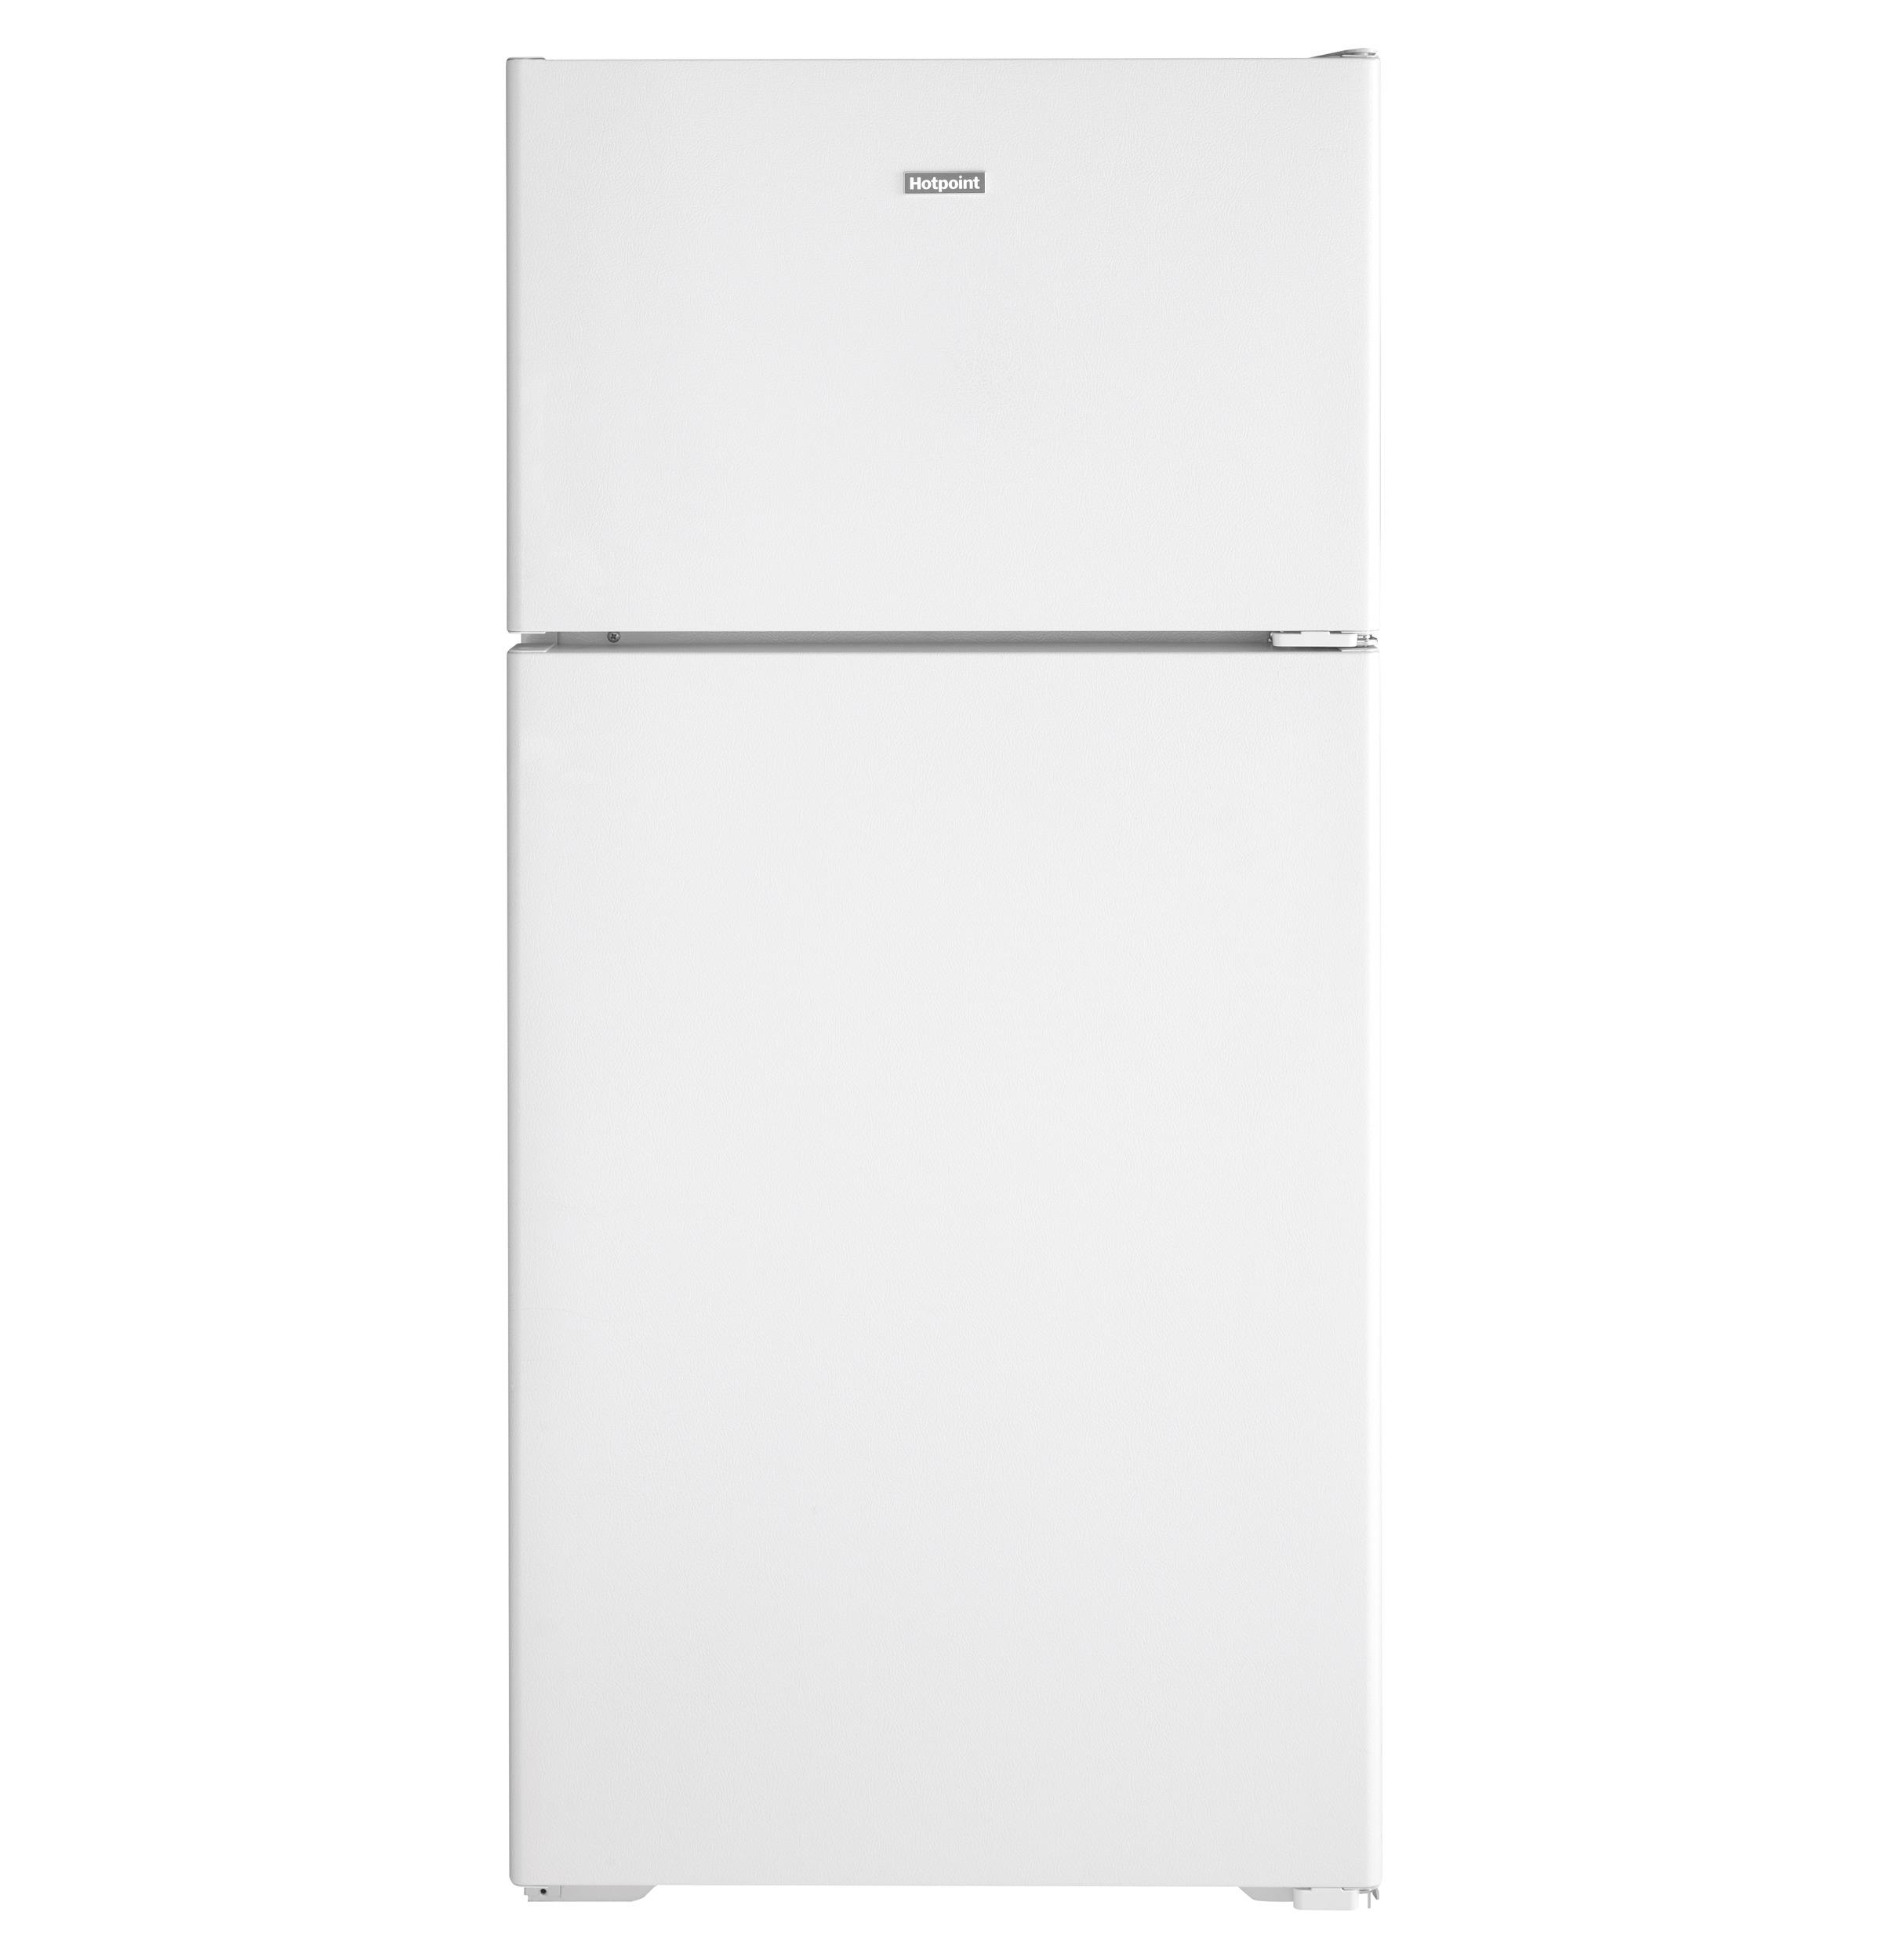 Hotpoint Hotpoint® ENERGY STAR® 15.6 Cu. Ft. Recessed Handle Top-Freezer Refrigerator